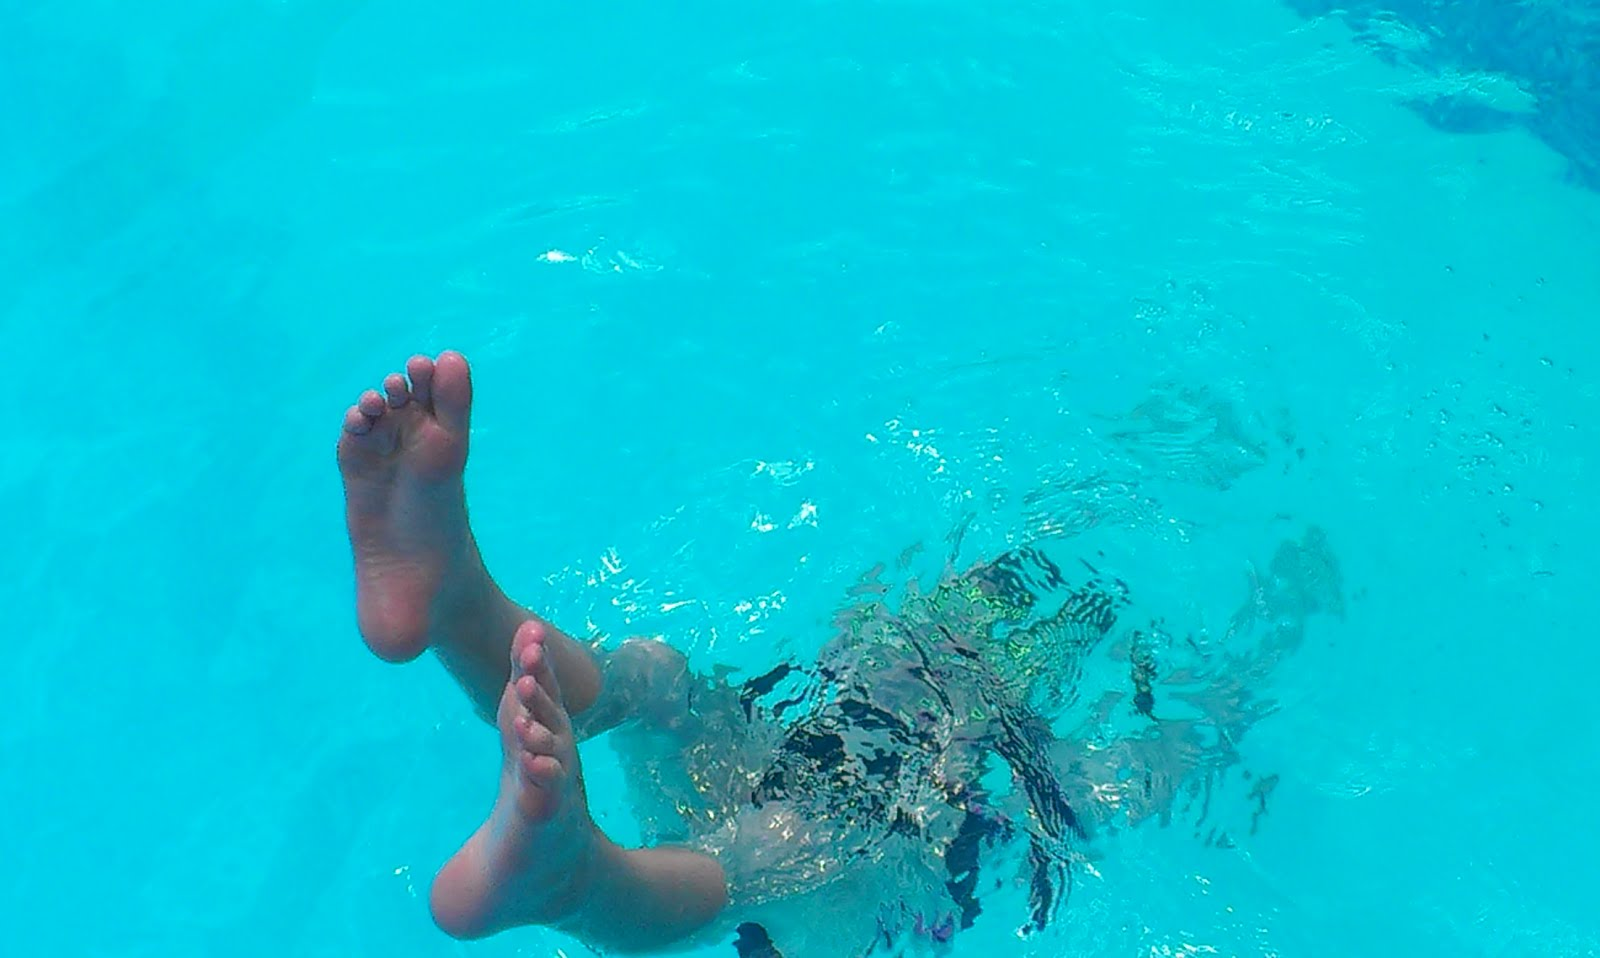 girls underwater tumblr